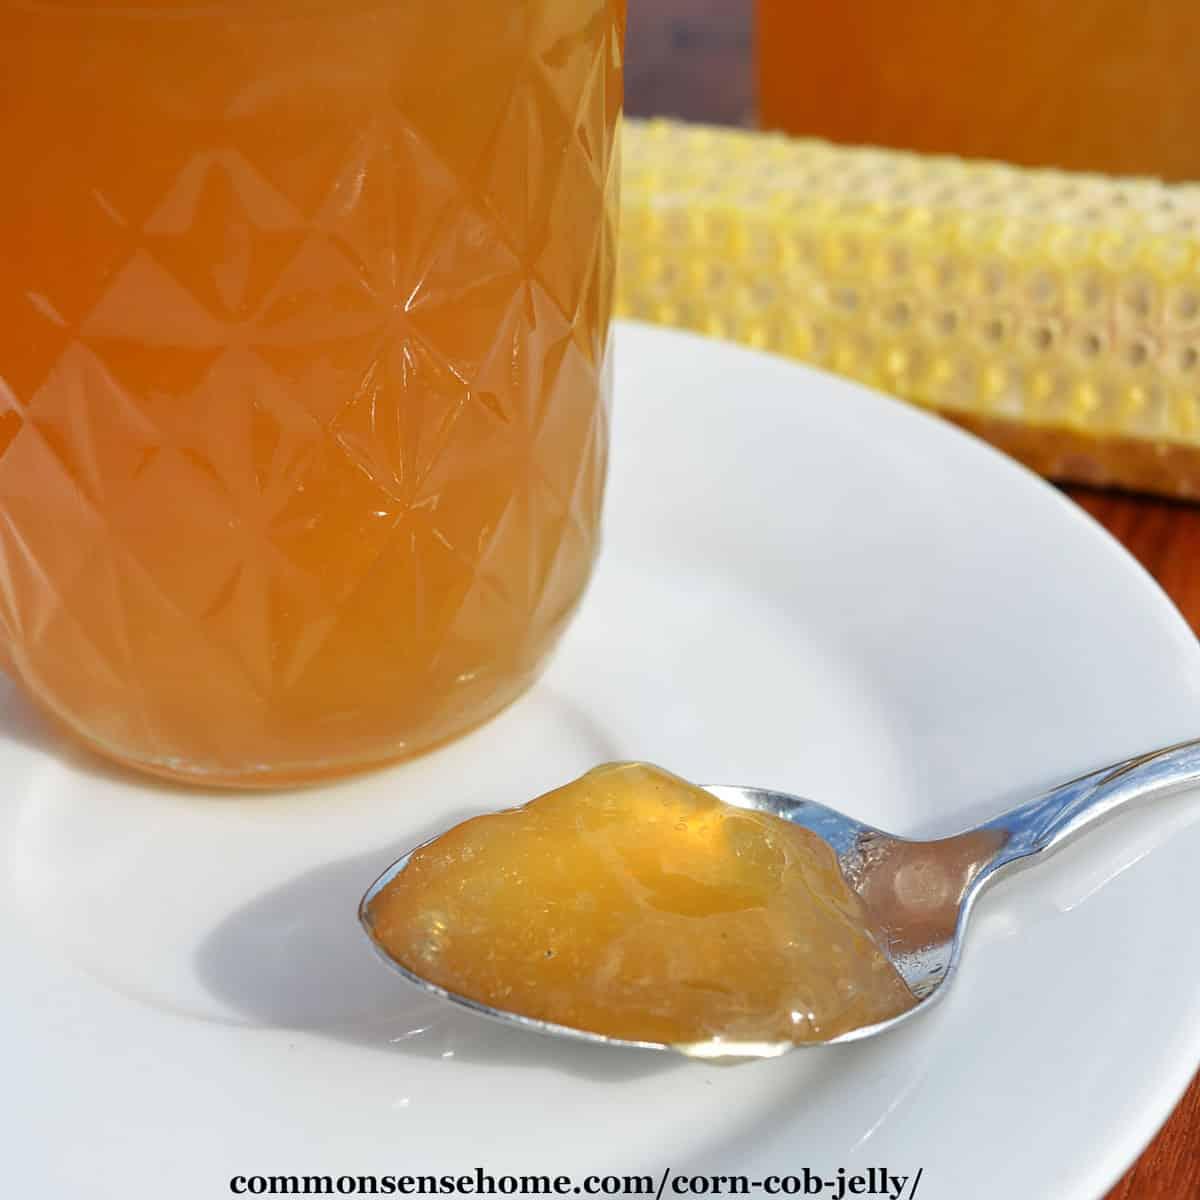 spoonful of corn cob jelly